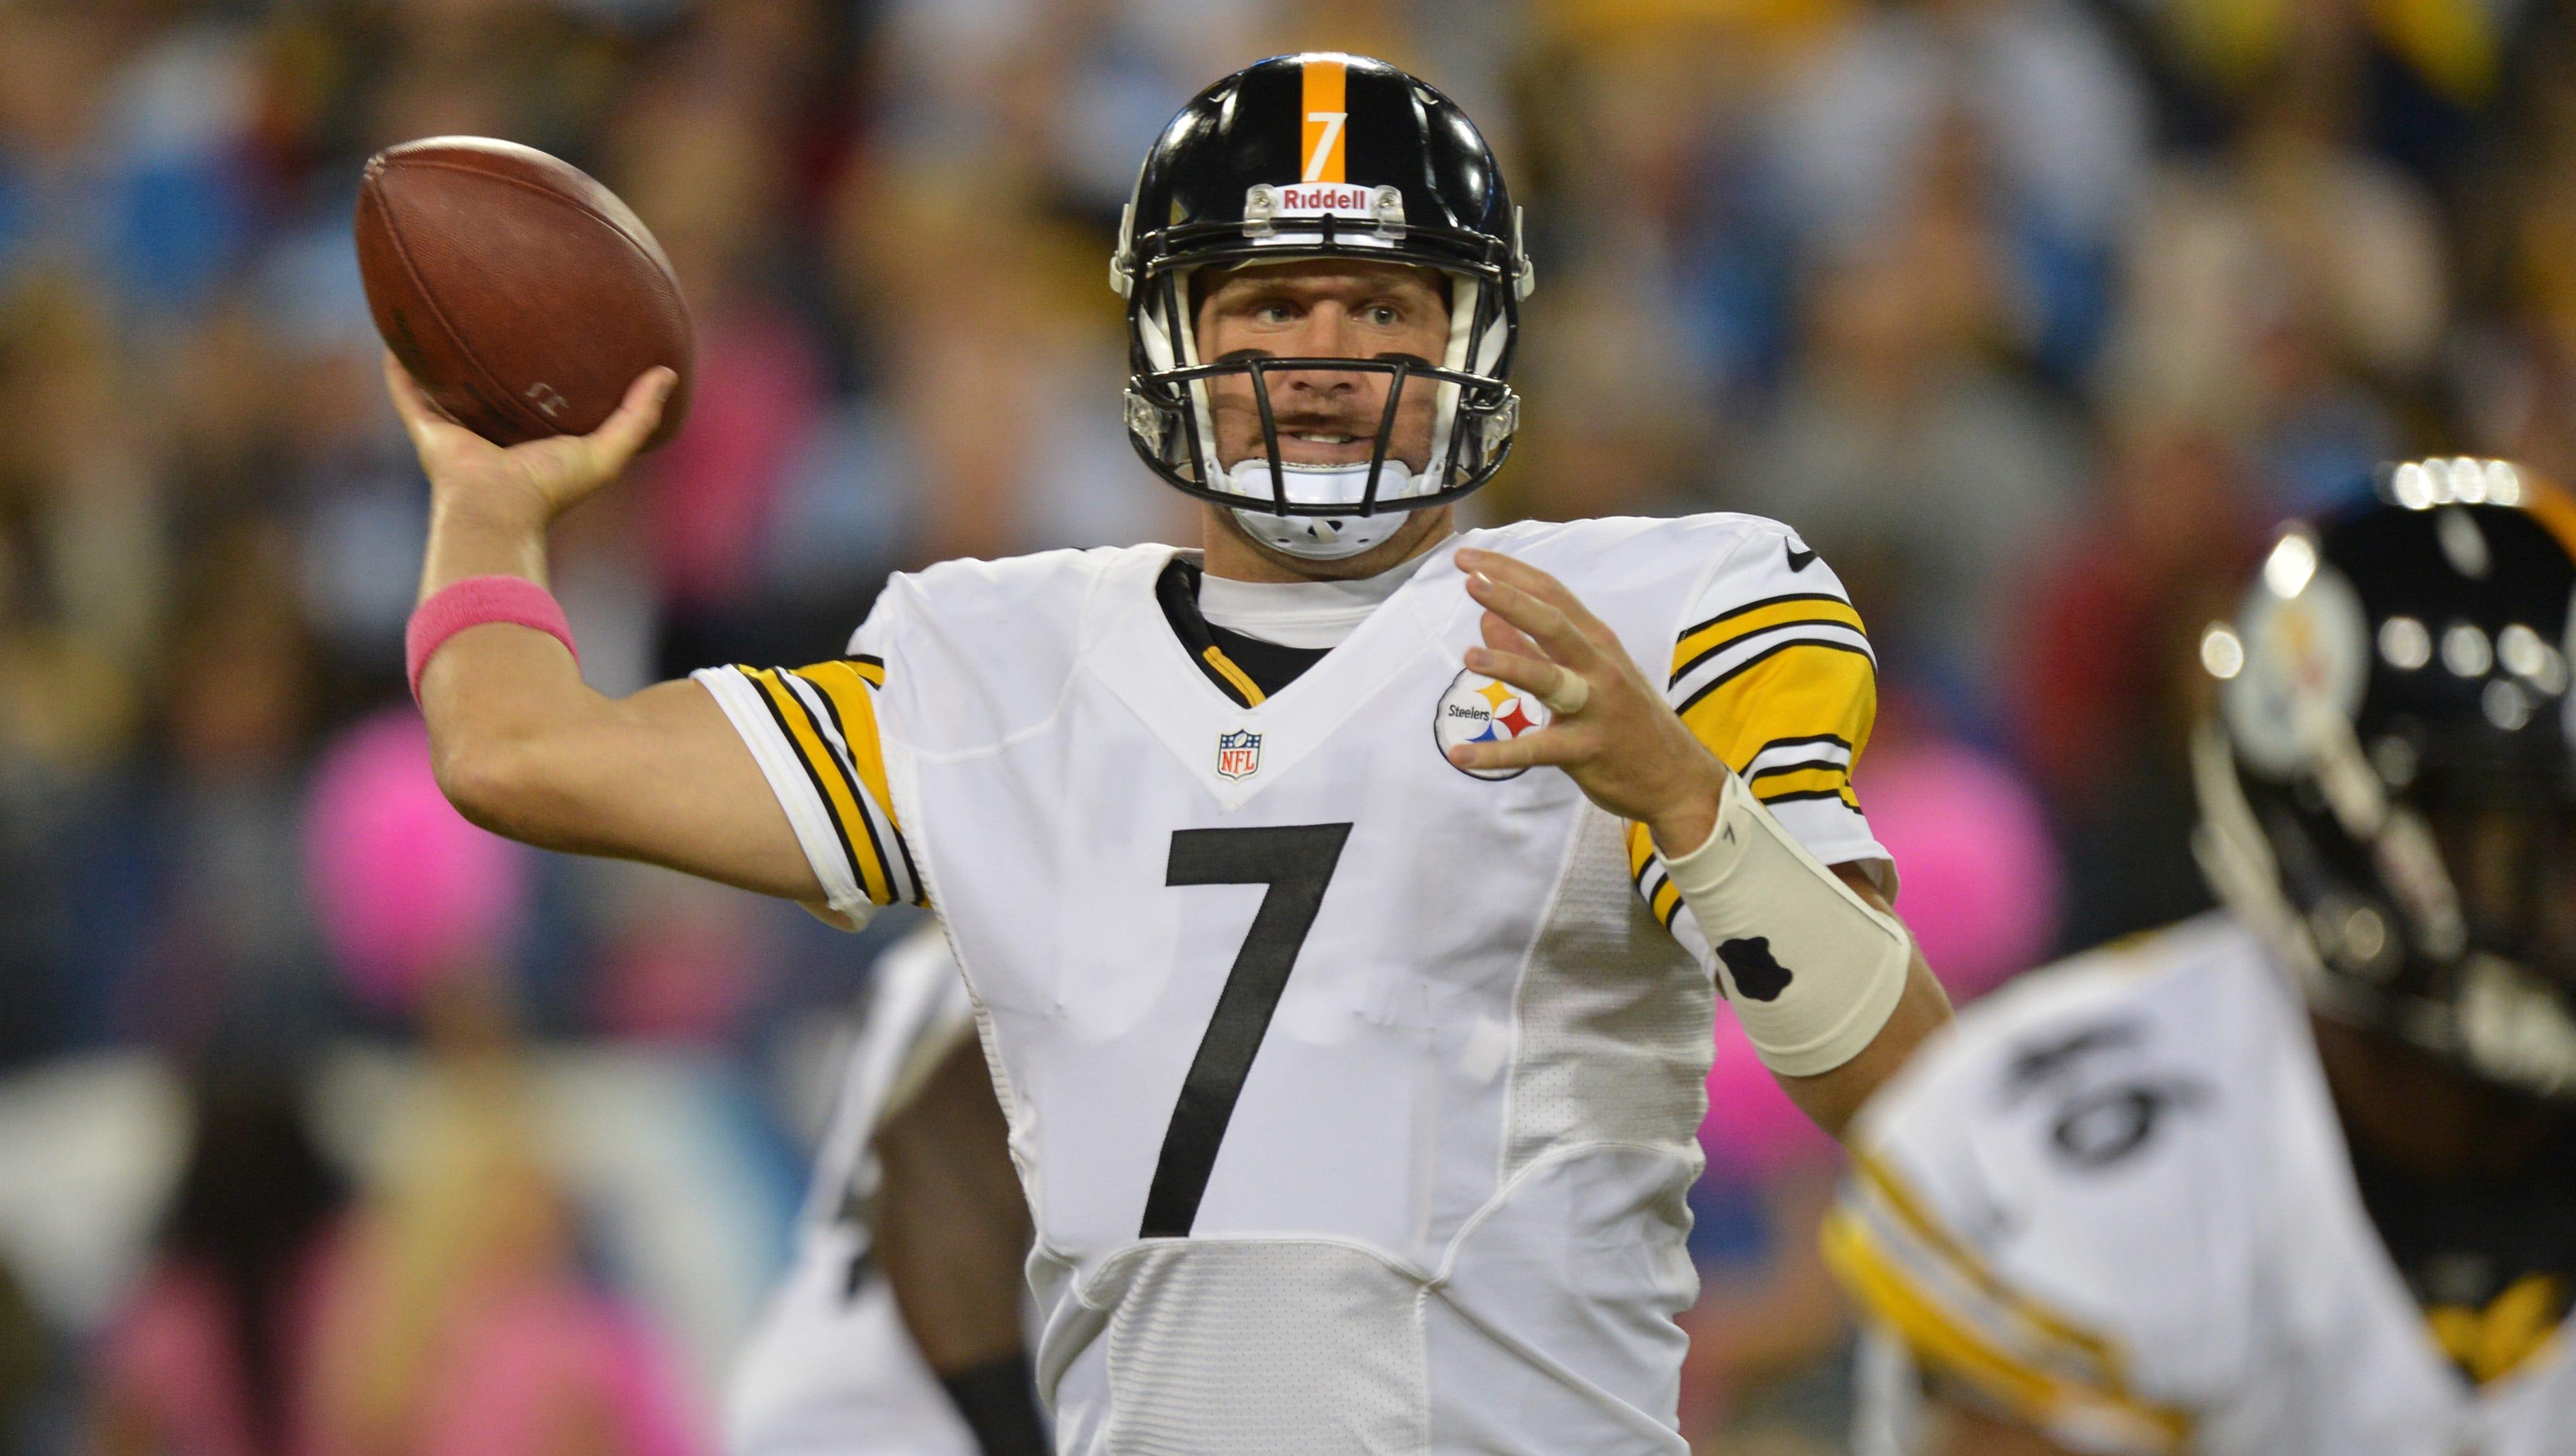 23. Ben Roethlisberger, Pittsburgh Steelers